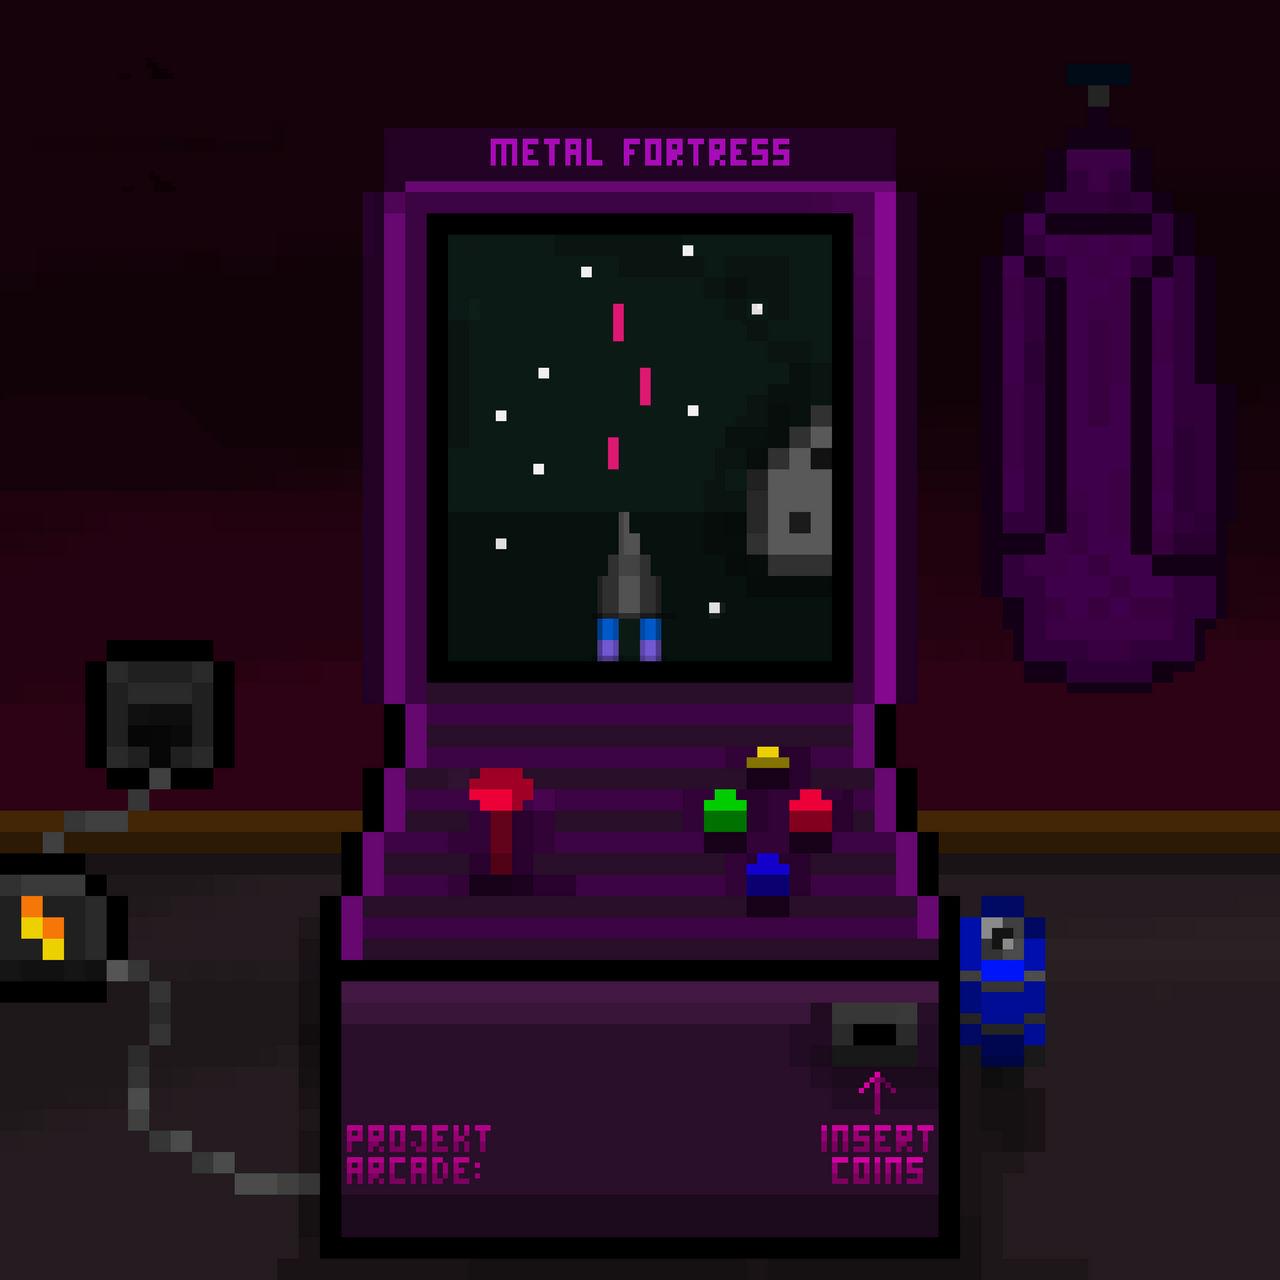 Album Art - Projekt Arcade Insert Coins